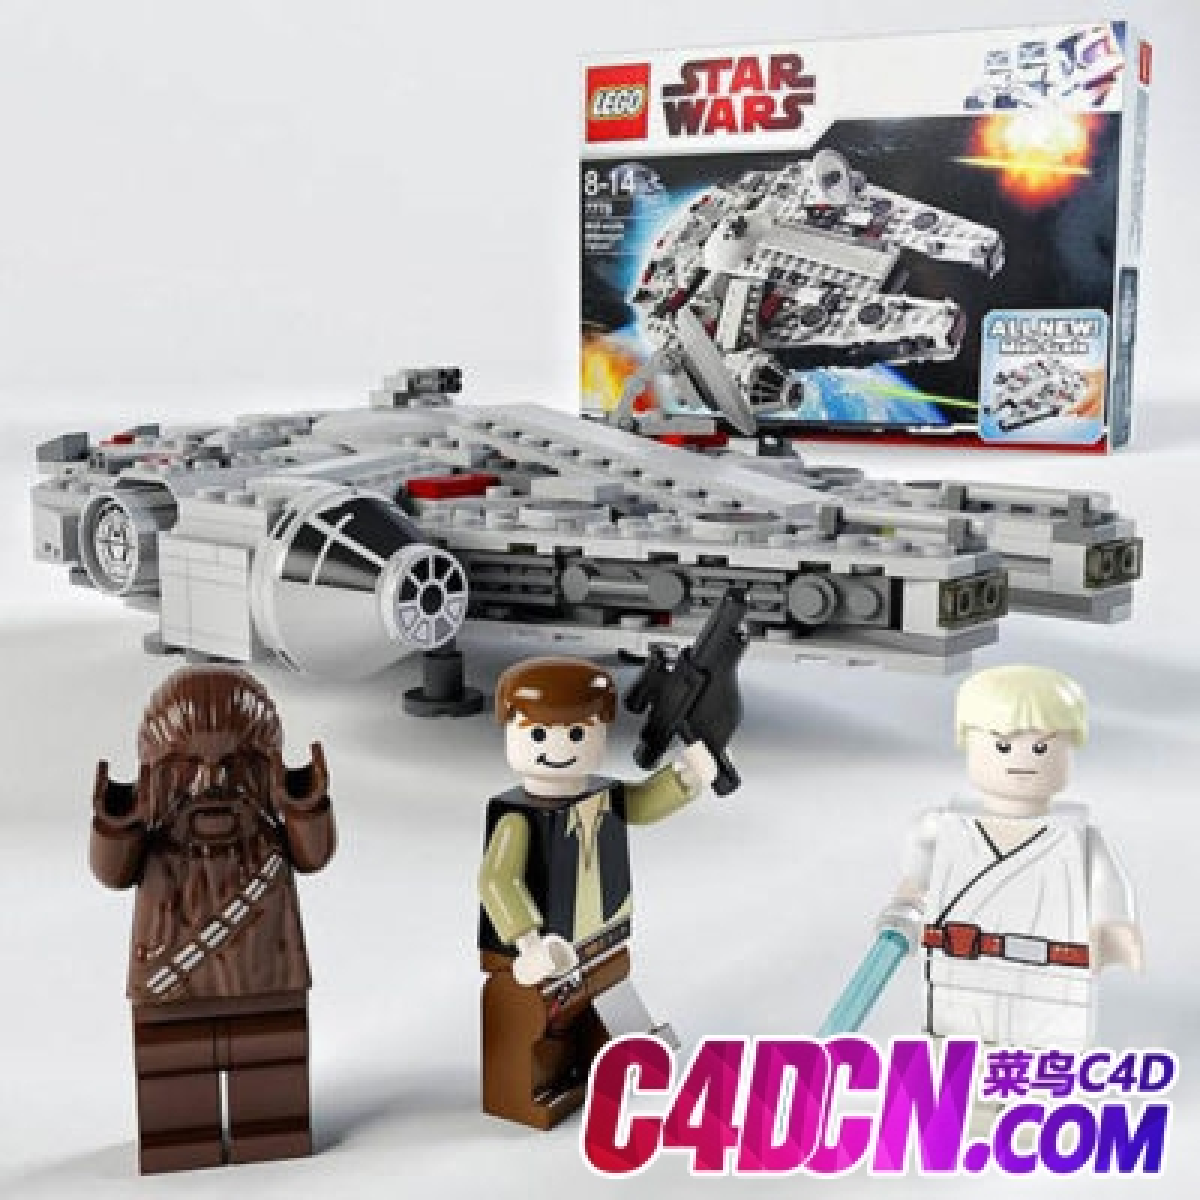 星球大战千年隼 乐高模型Midi-scale Millennium Falcon Lego Star Wars